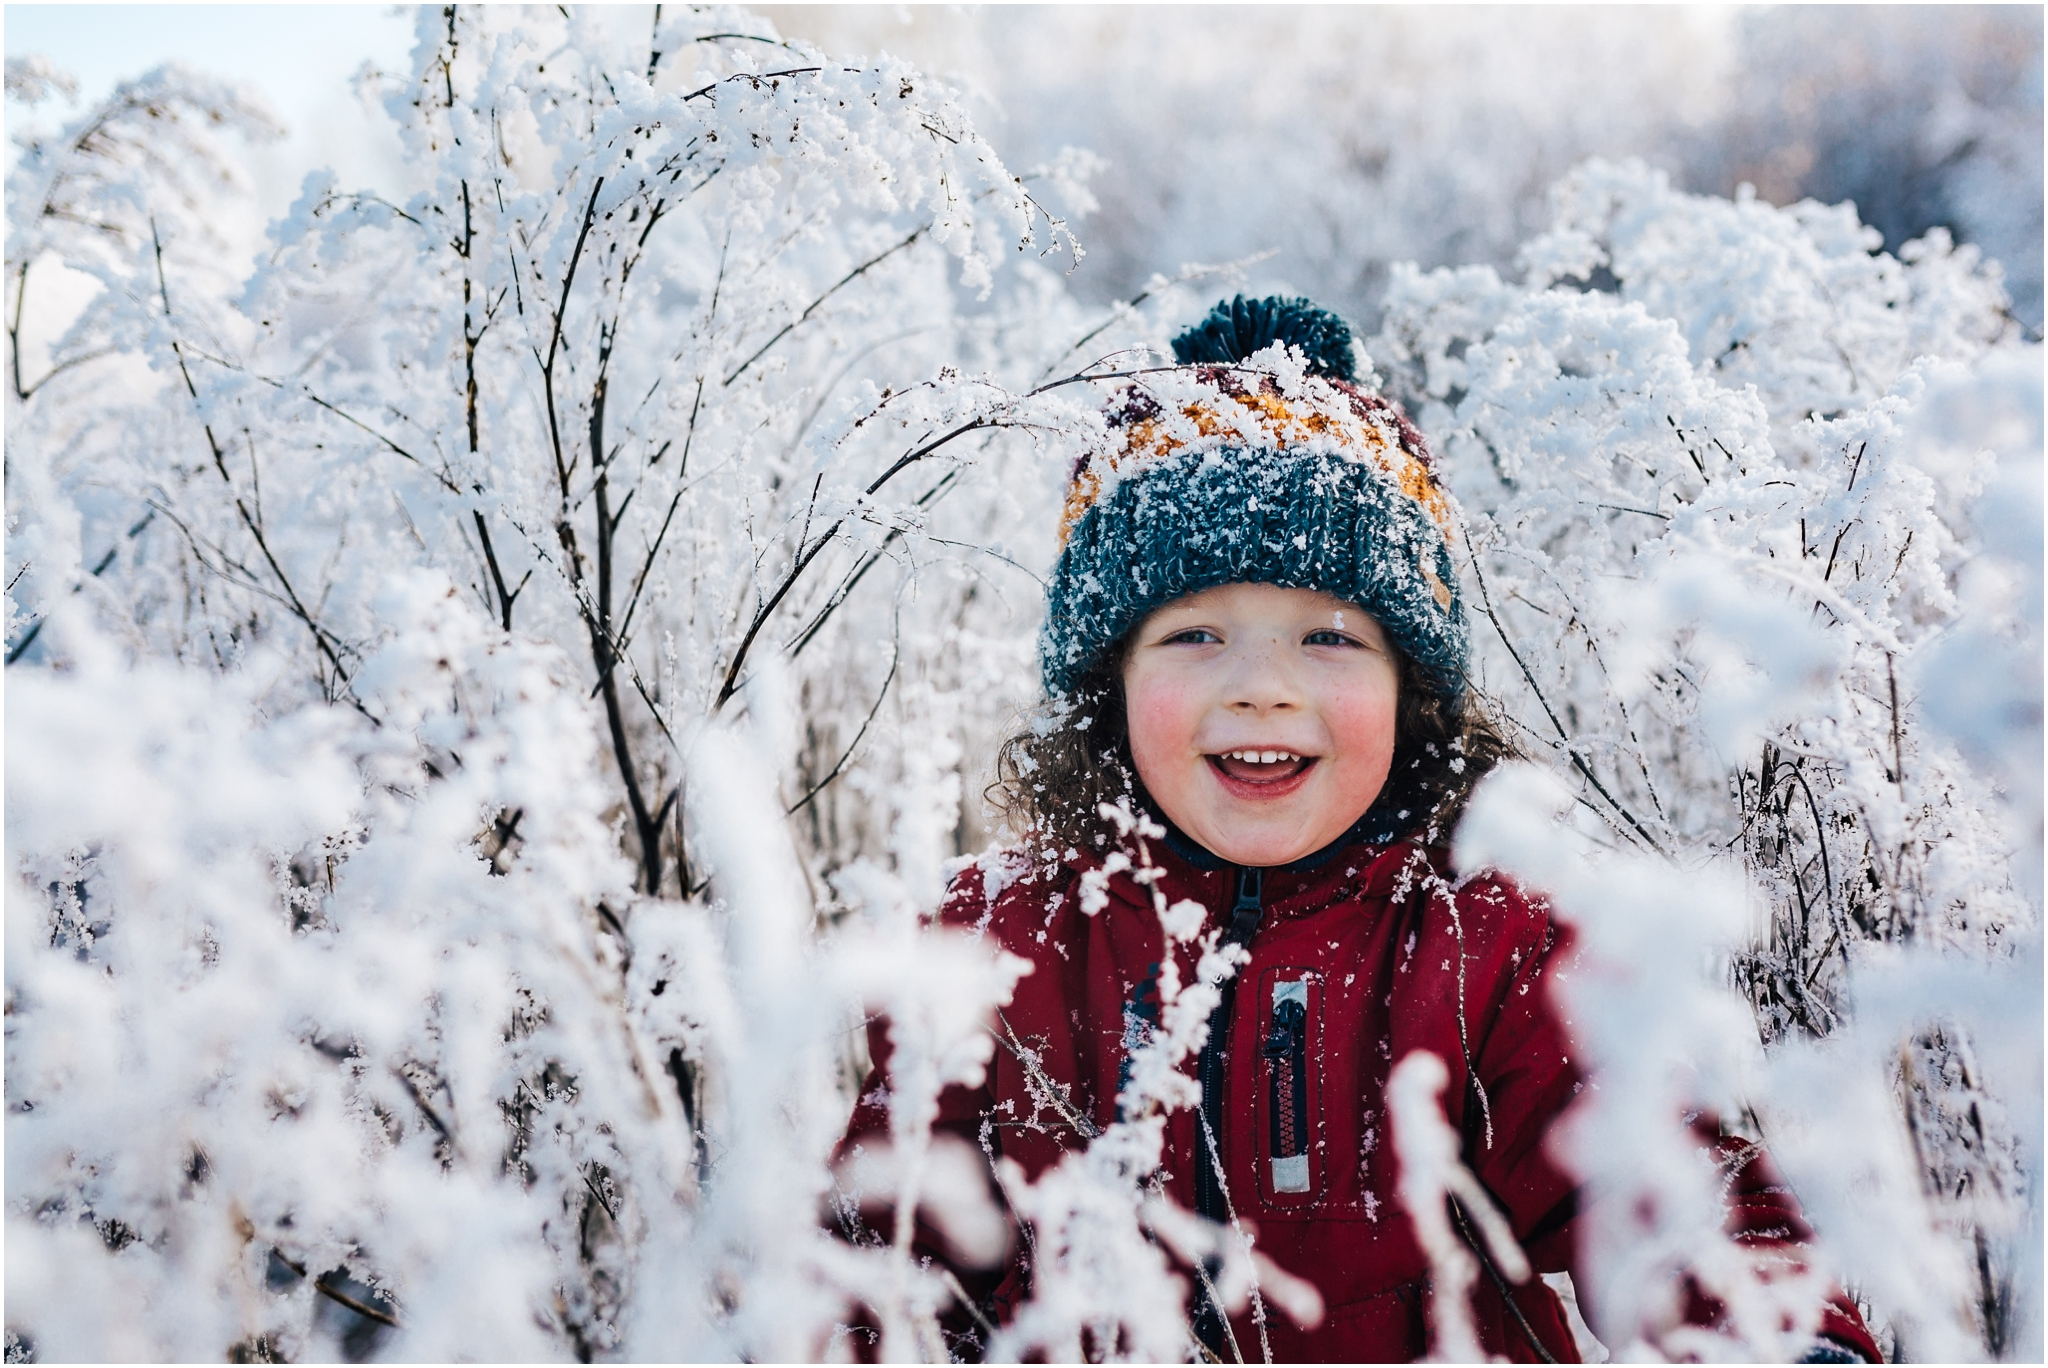 Treelines Photography - Edmonton Lifestyle Photographer - Edmonton Hoar Frost - January